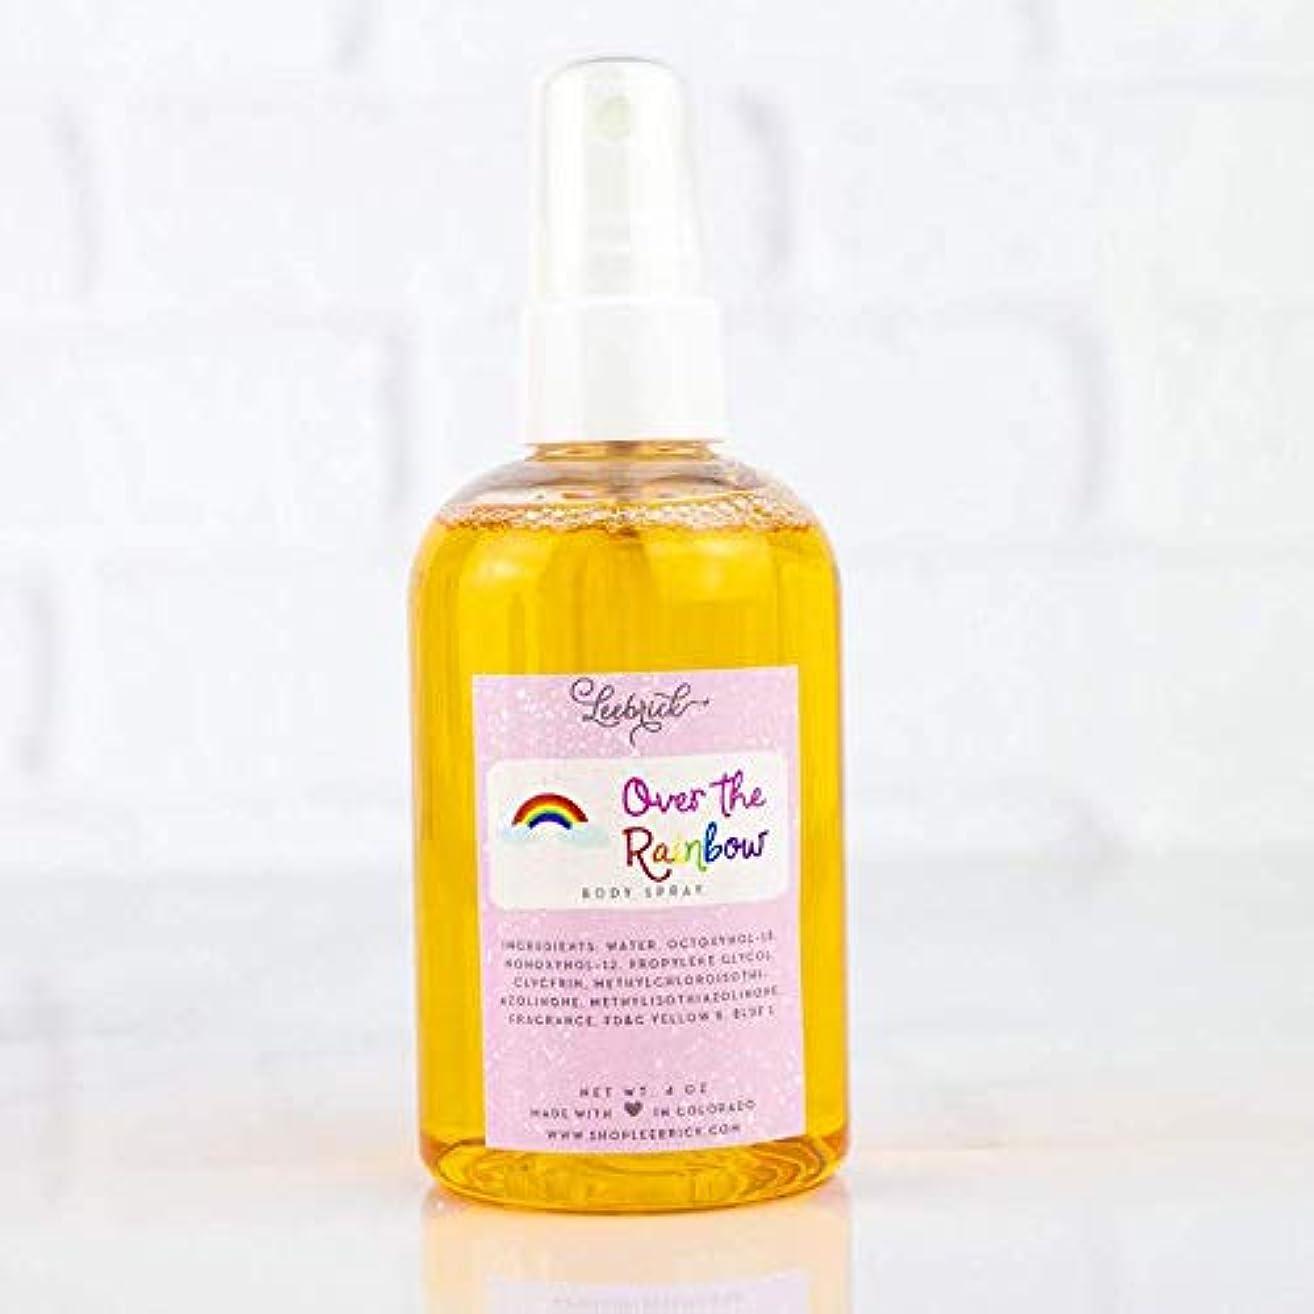 Over the Rainbow Scented Moisturizing Body Spray Oil Mist for Women - 4 oz